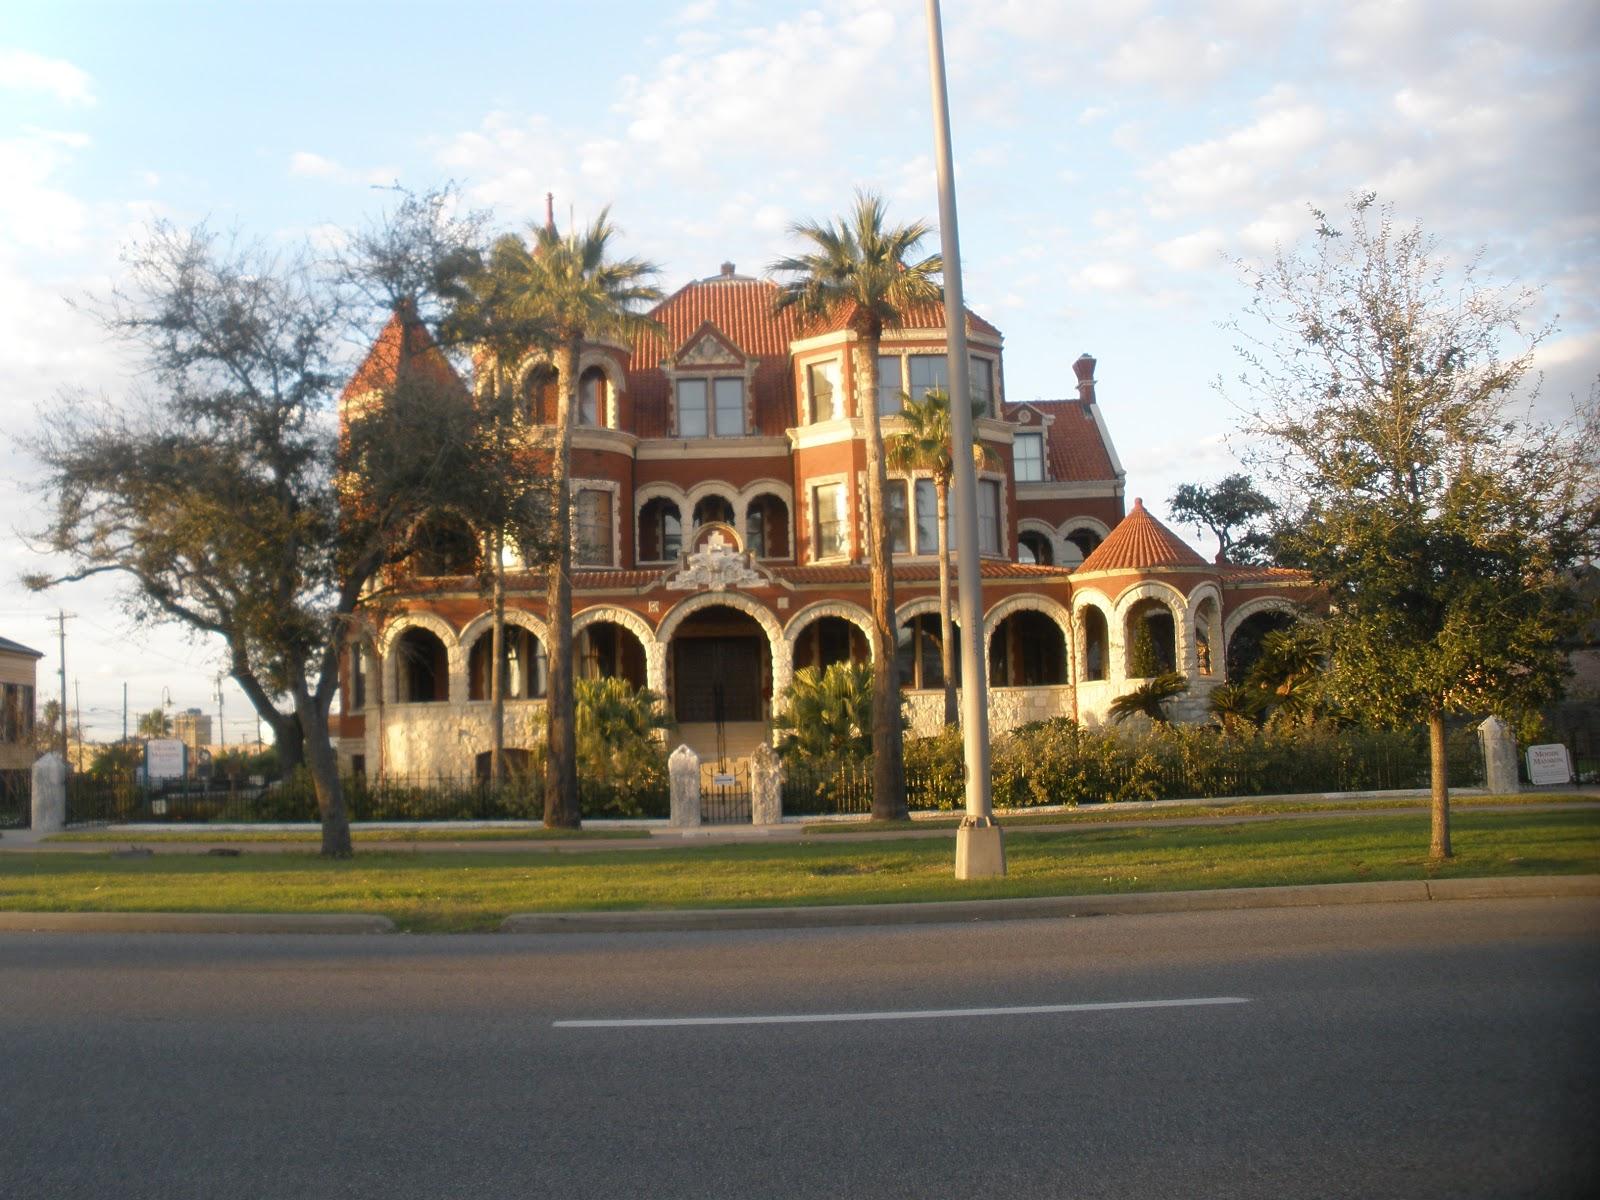 And I Wander: Moody Mansion and Bishop\'s Palace